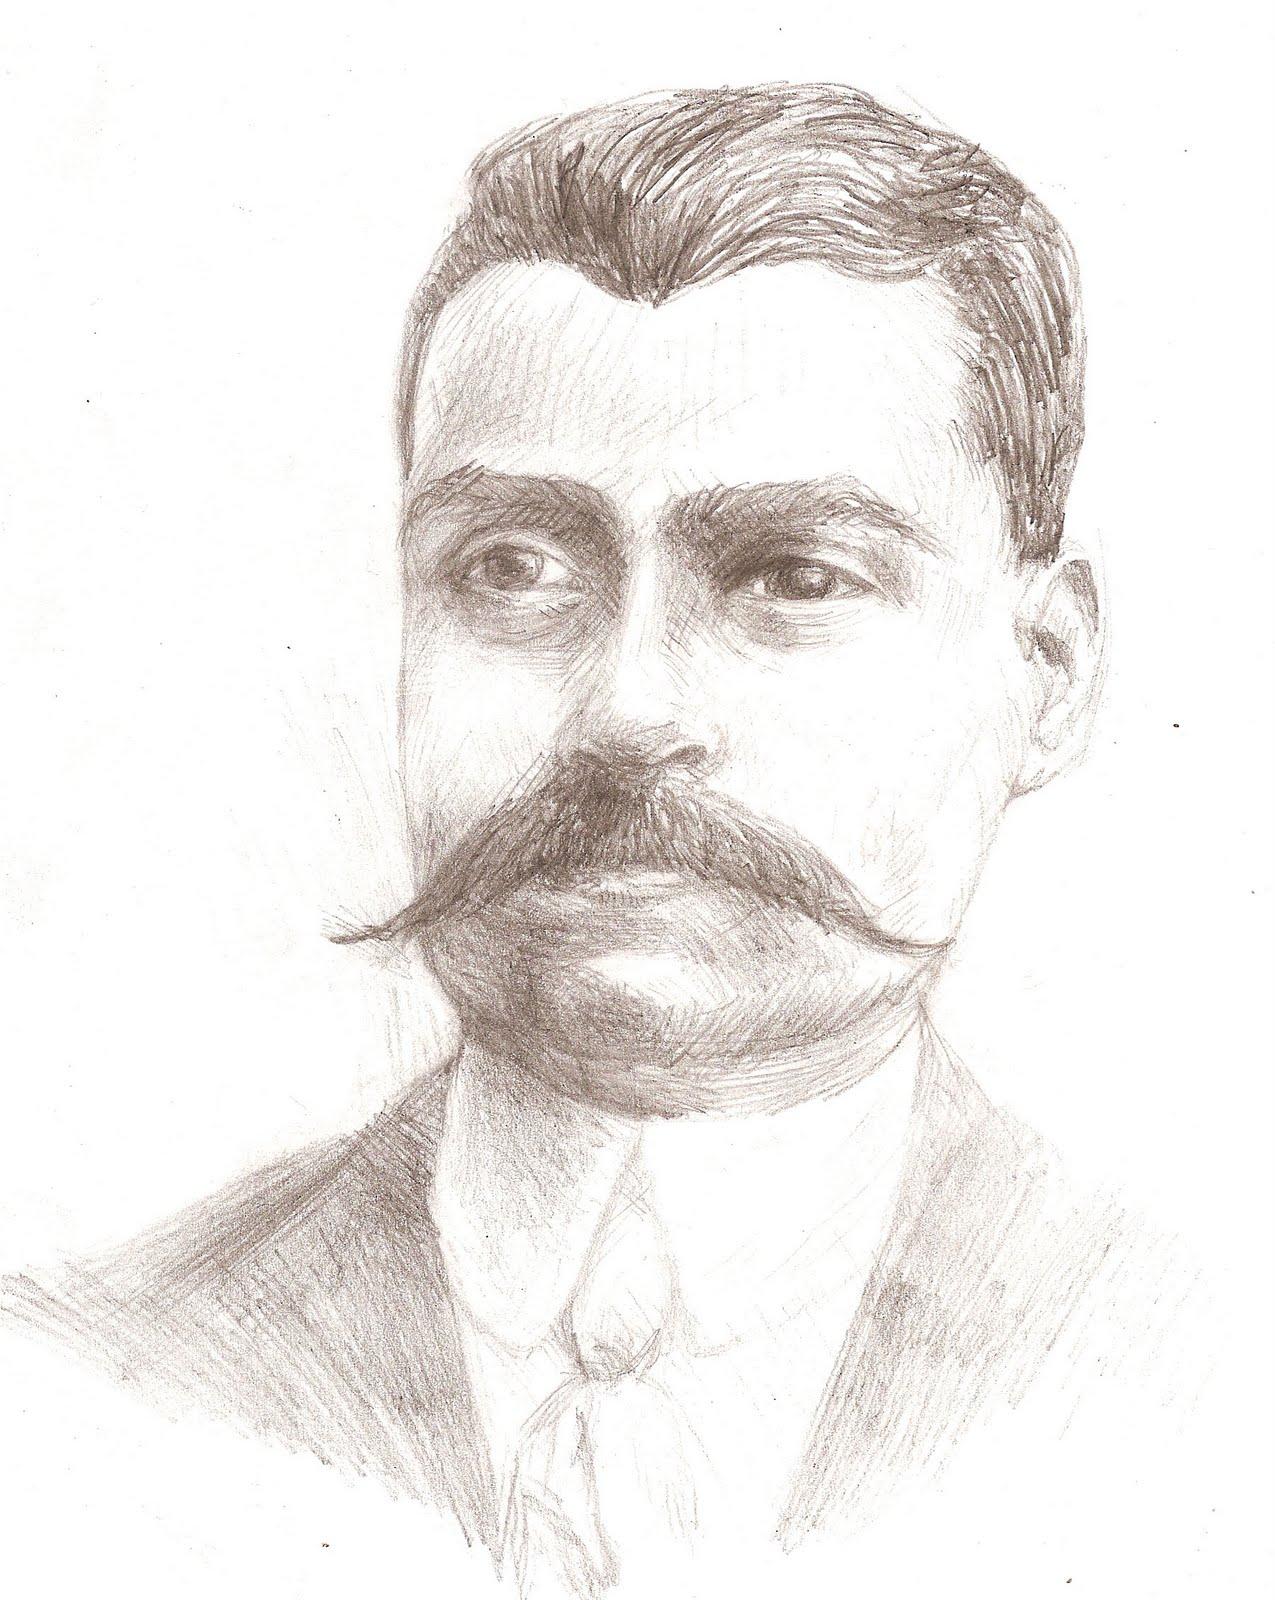 Emiliano Zapata. August 8, 1879 - April 10, 1919. Hero of the Mexican ...